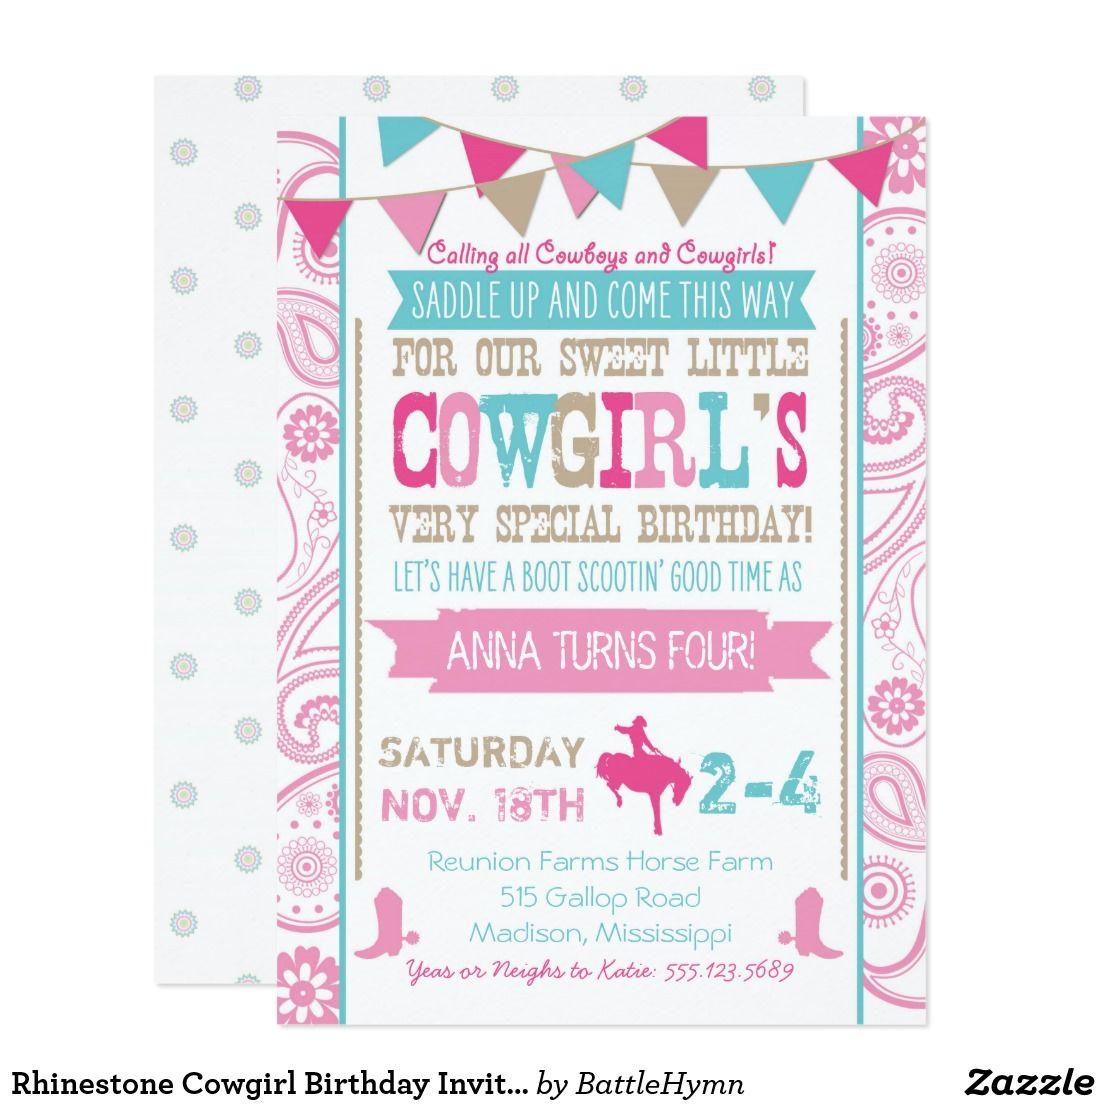 Rhinestone Cowgirl Birthday Invitation | { Happy Birthday ...